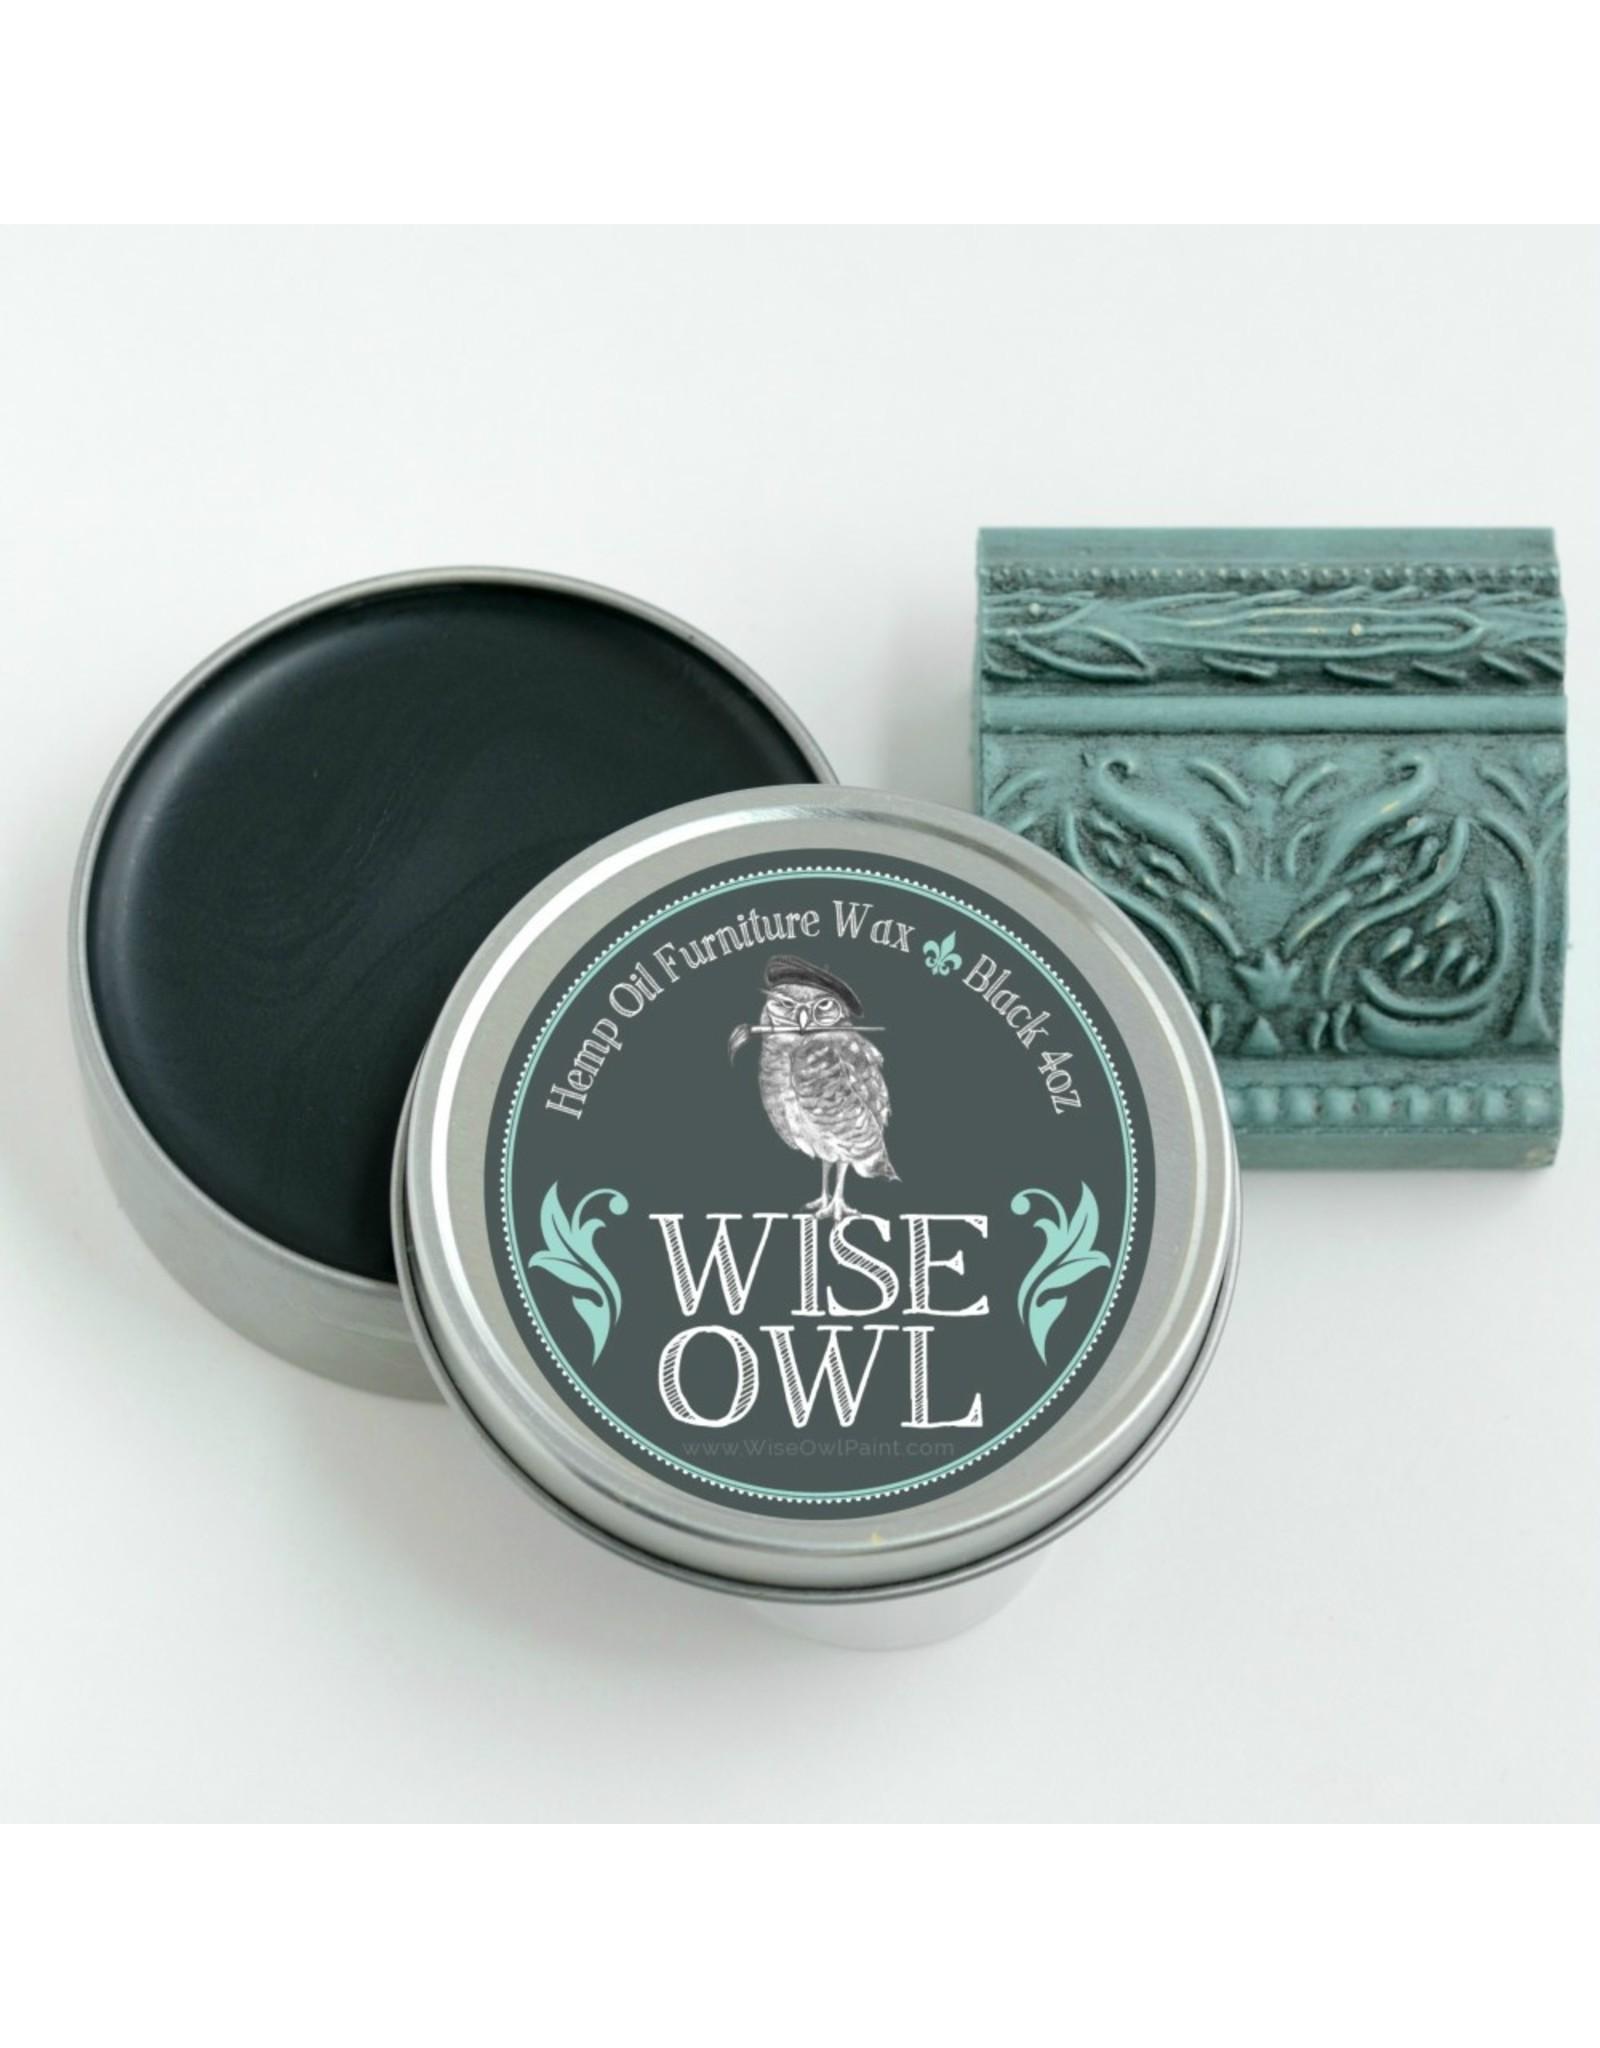 Wise Owl Paint Hemp Oil Furniture Wax-Black 4oz